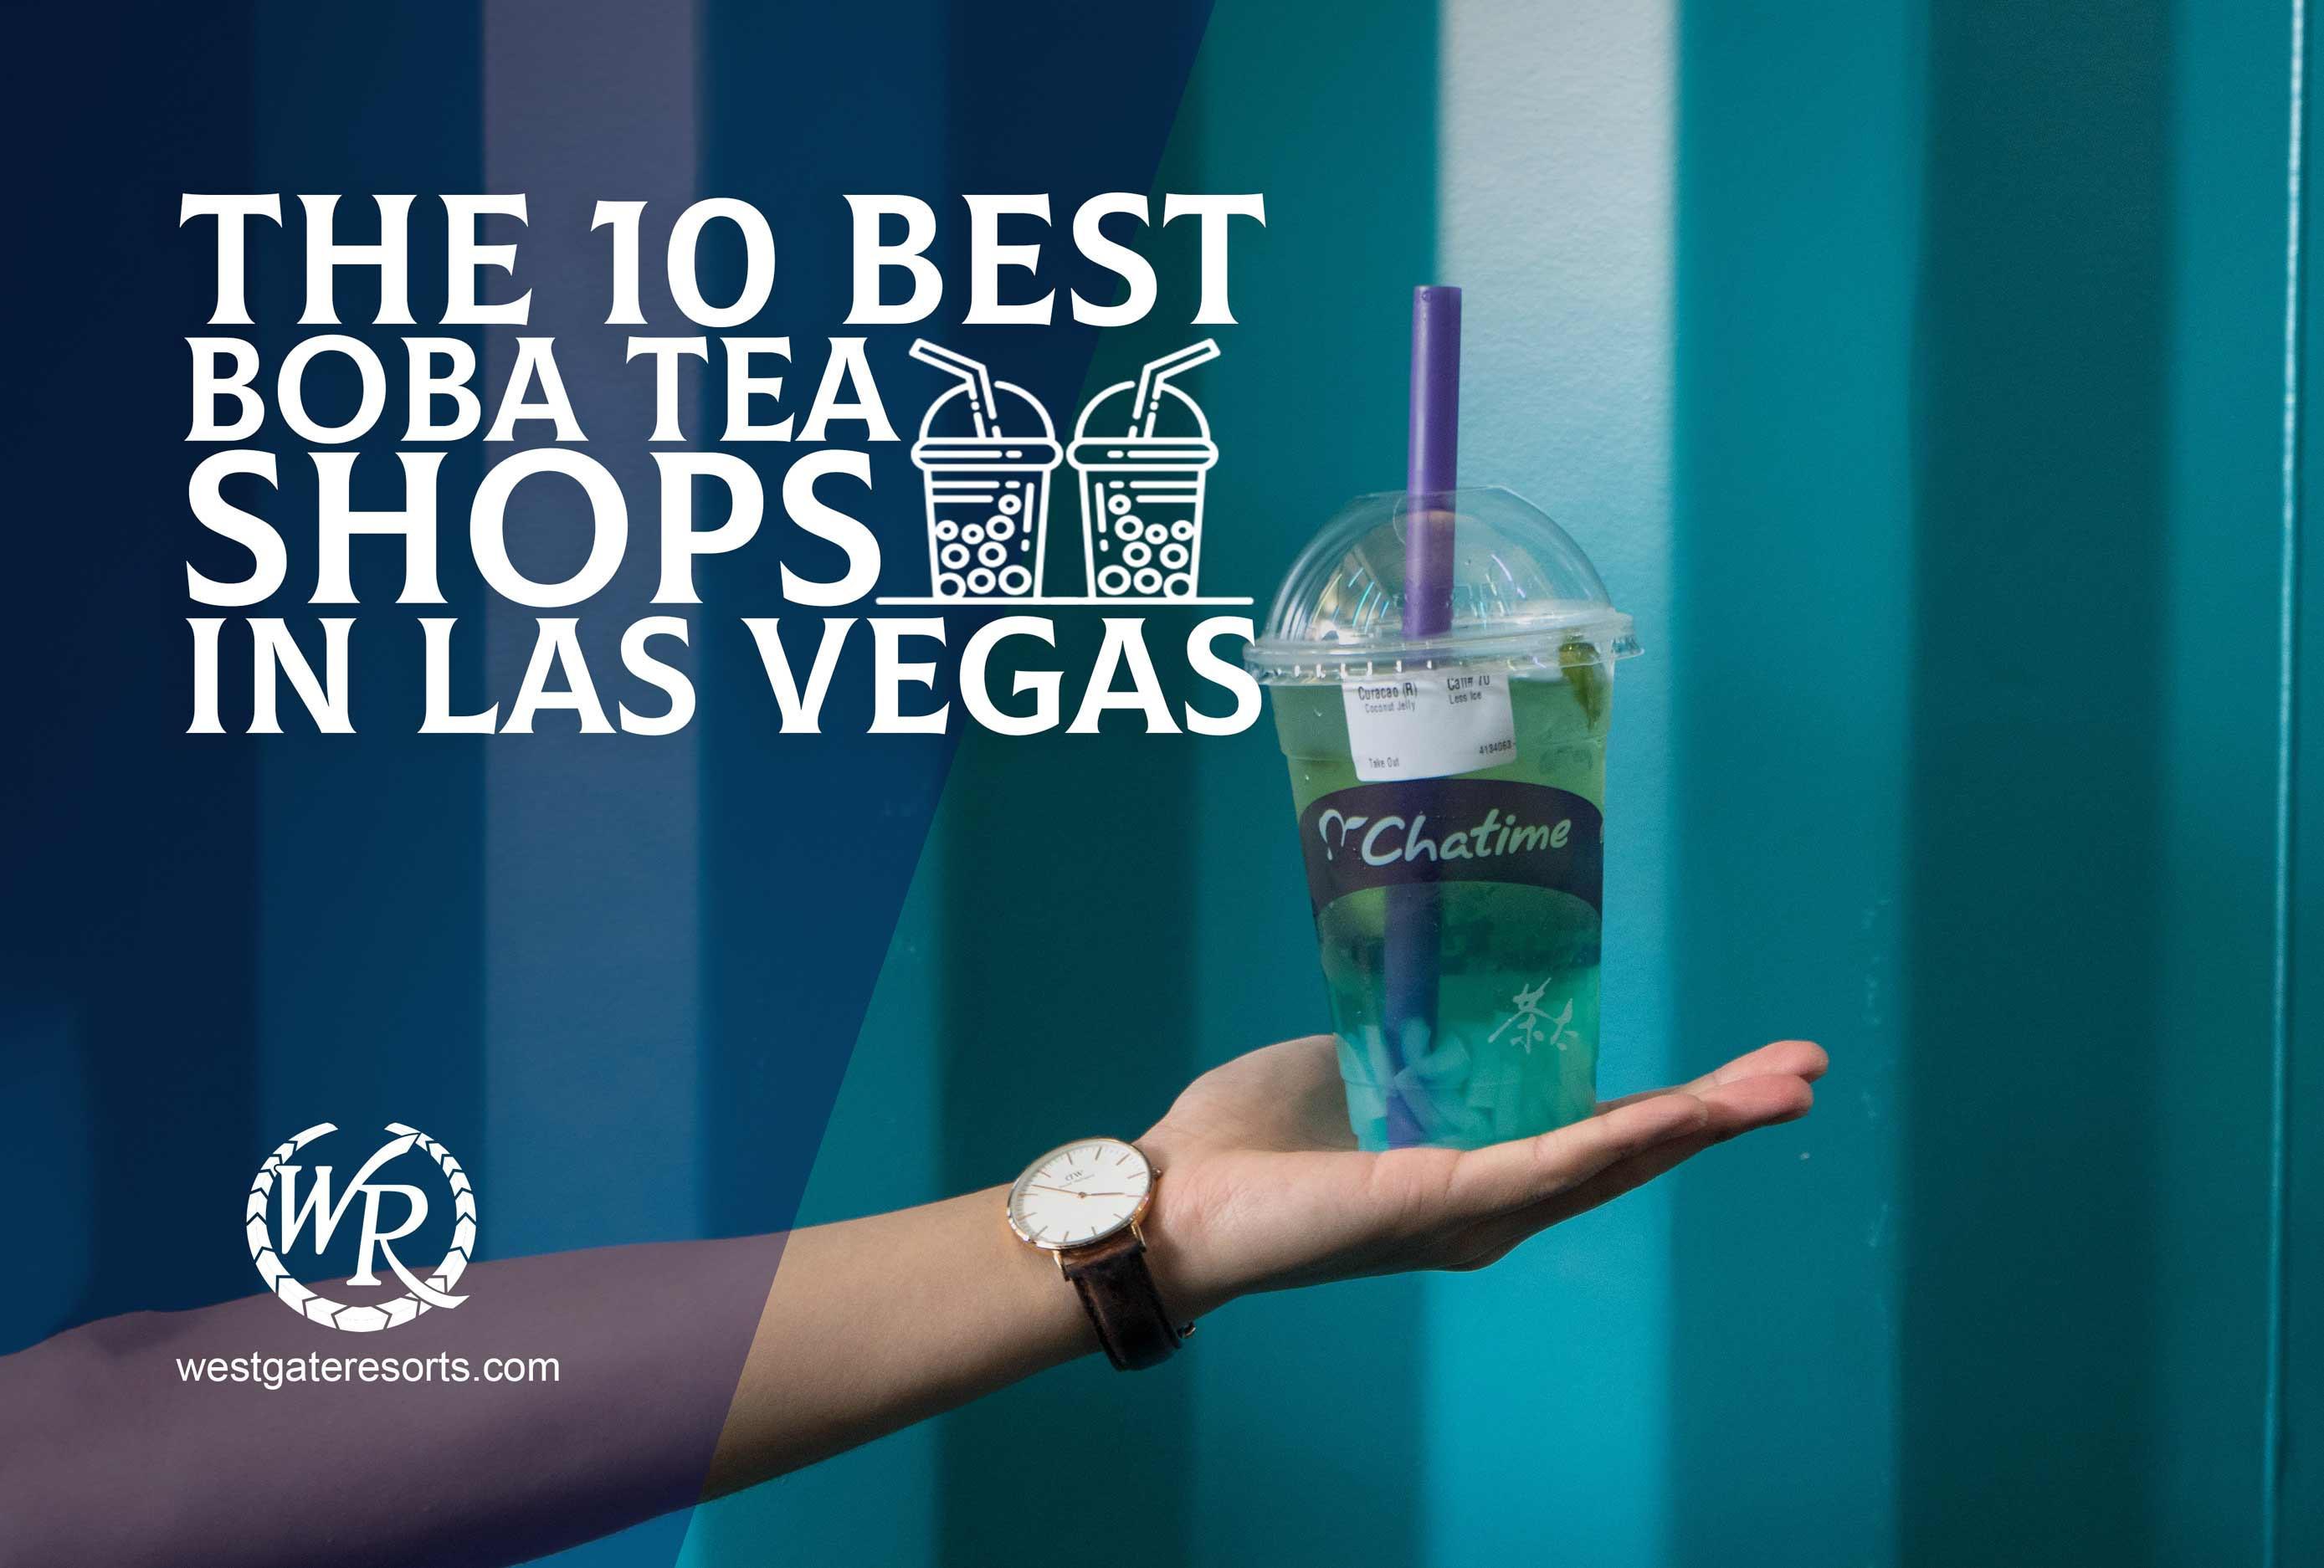 The 10 Best Boba Tea Shops in Las Vegas